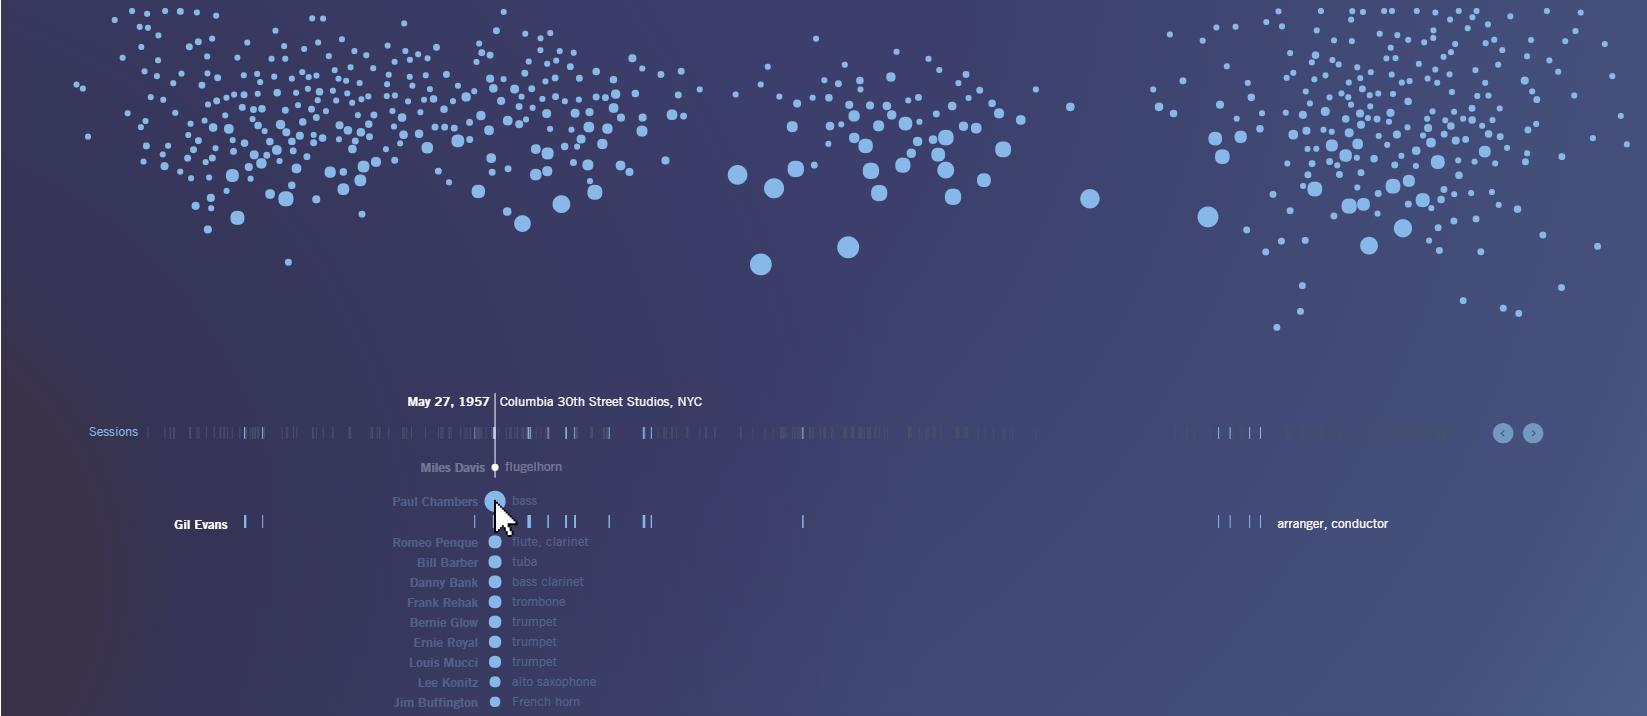 datavisualizationtips_milesdavis.png